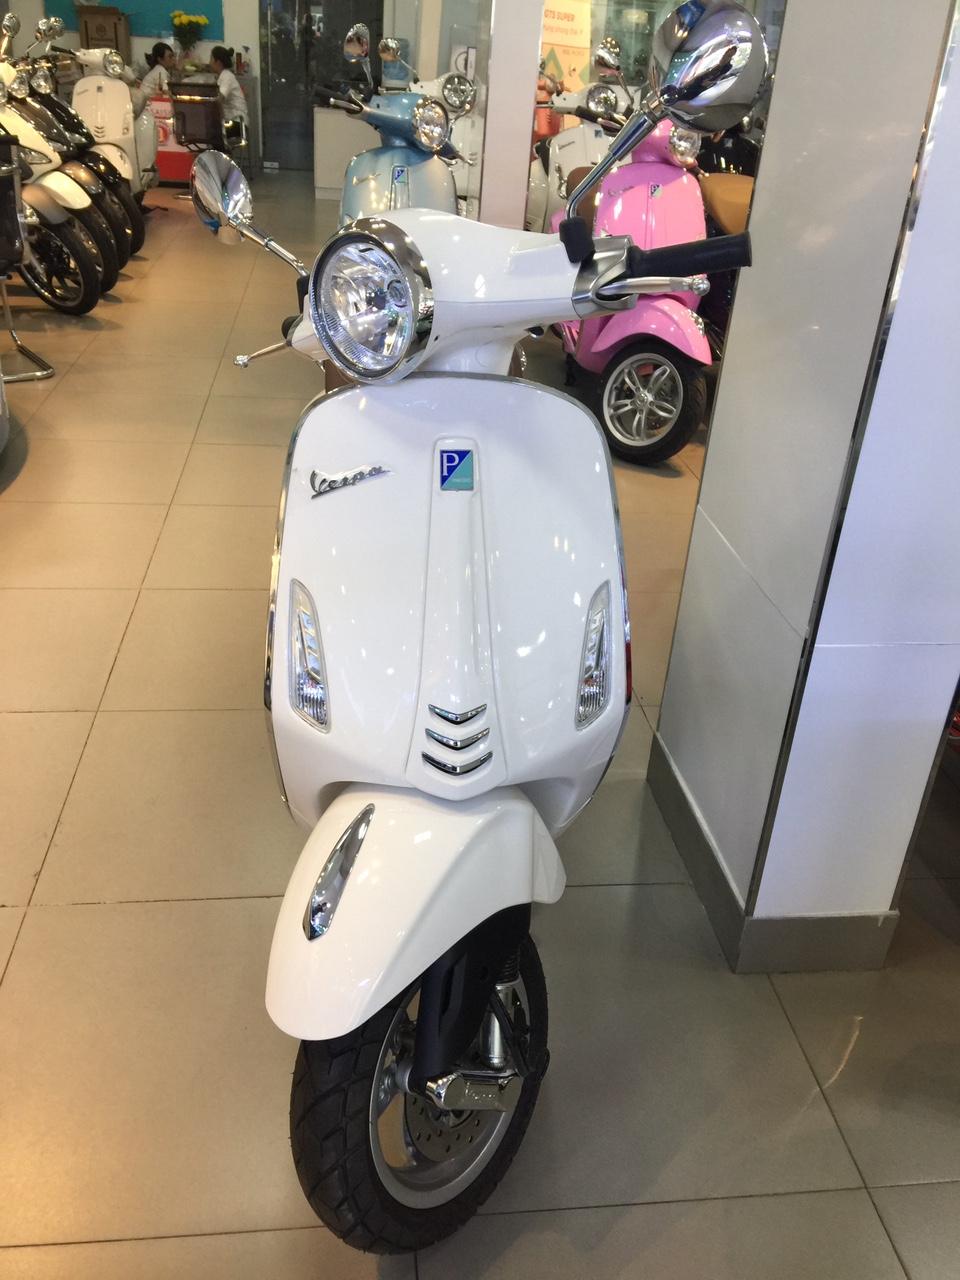 Mua xe Vespa Primavera 2017 tai HCM Chuong trinh Hot - 5